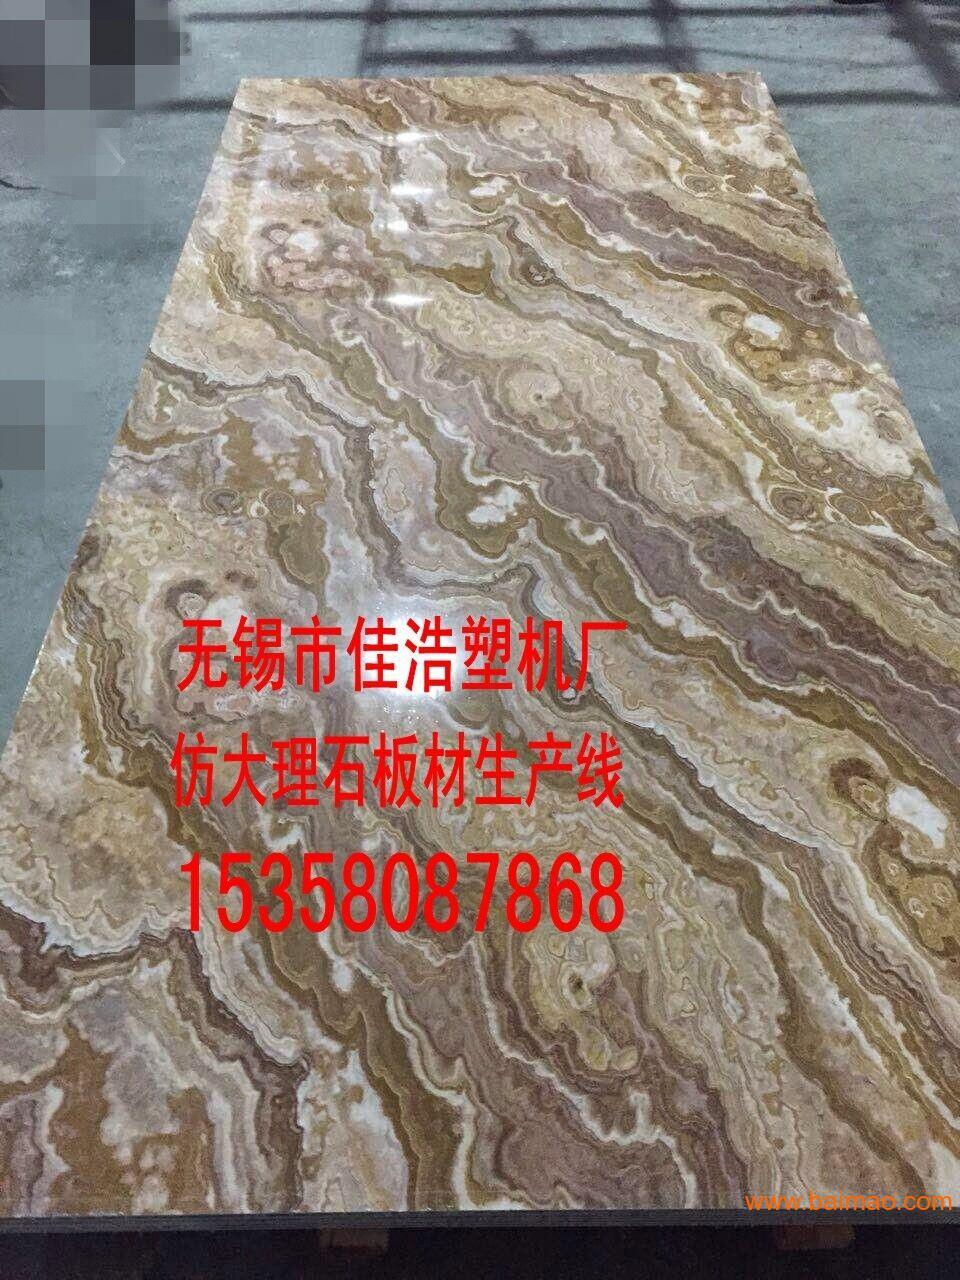 uv仿石材板-仿真大理石uv板-「其他装饰线板」-马可波罗网